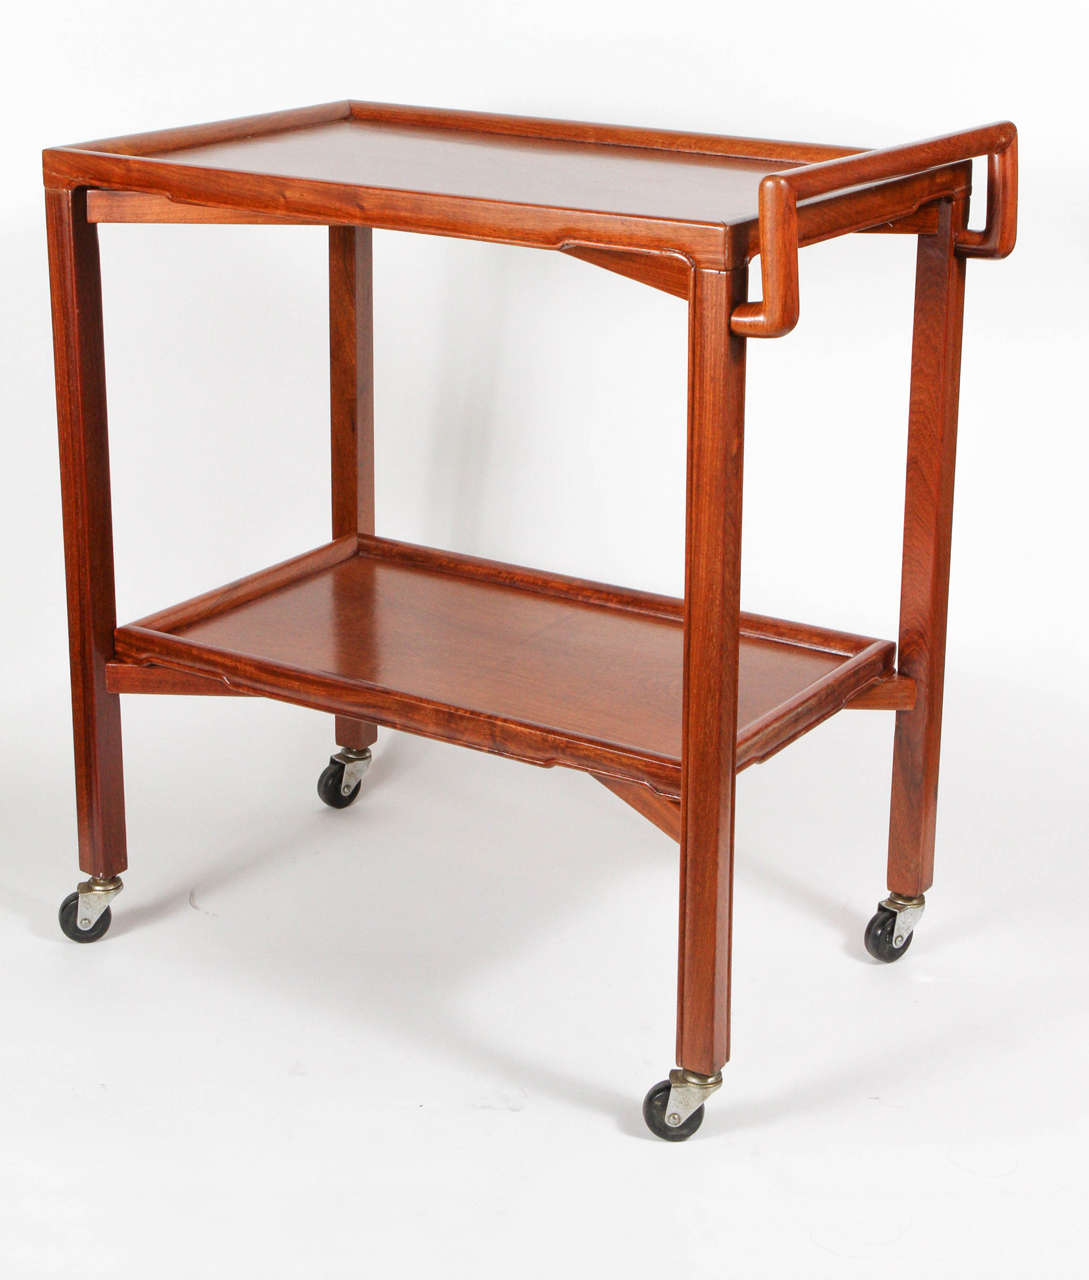 mid century teak bar cart at 1stdibs. Black Bedroom Furniture Sets. Home Design Ideas